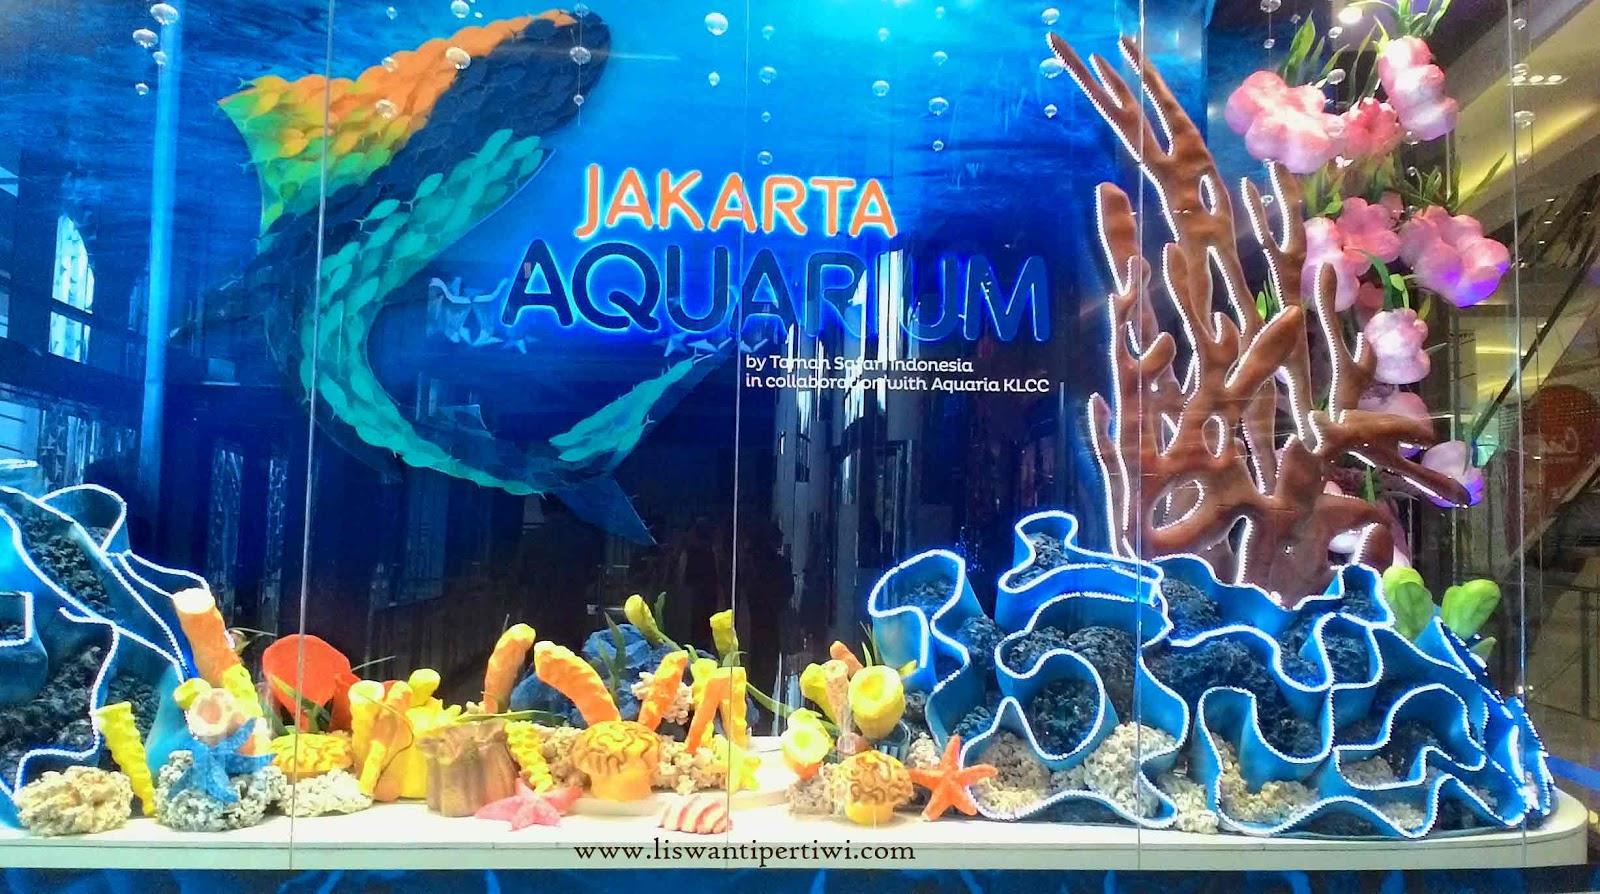 Melihat Penguin Dari Dekat Di Jakarta Aquarium Liswanti